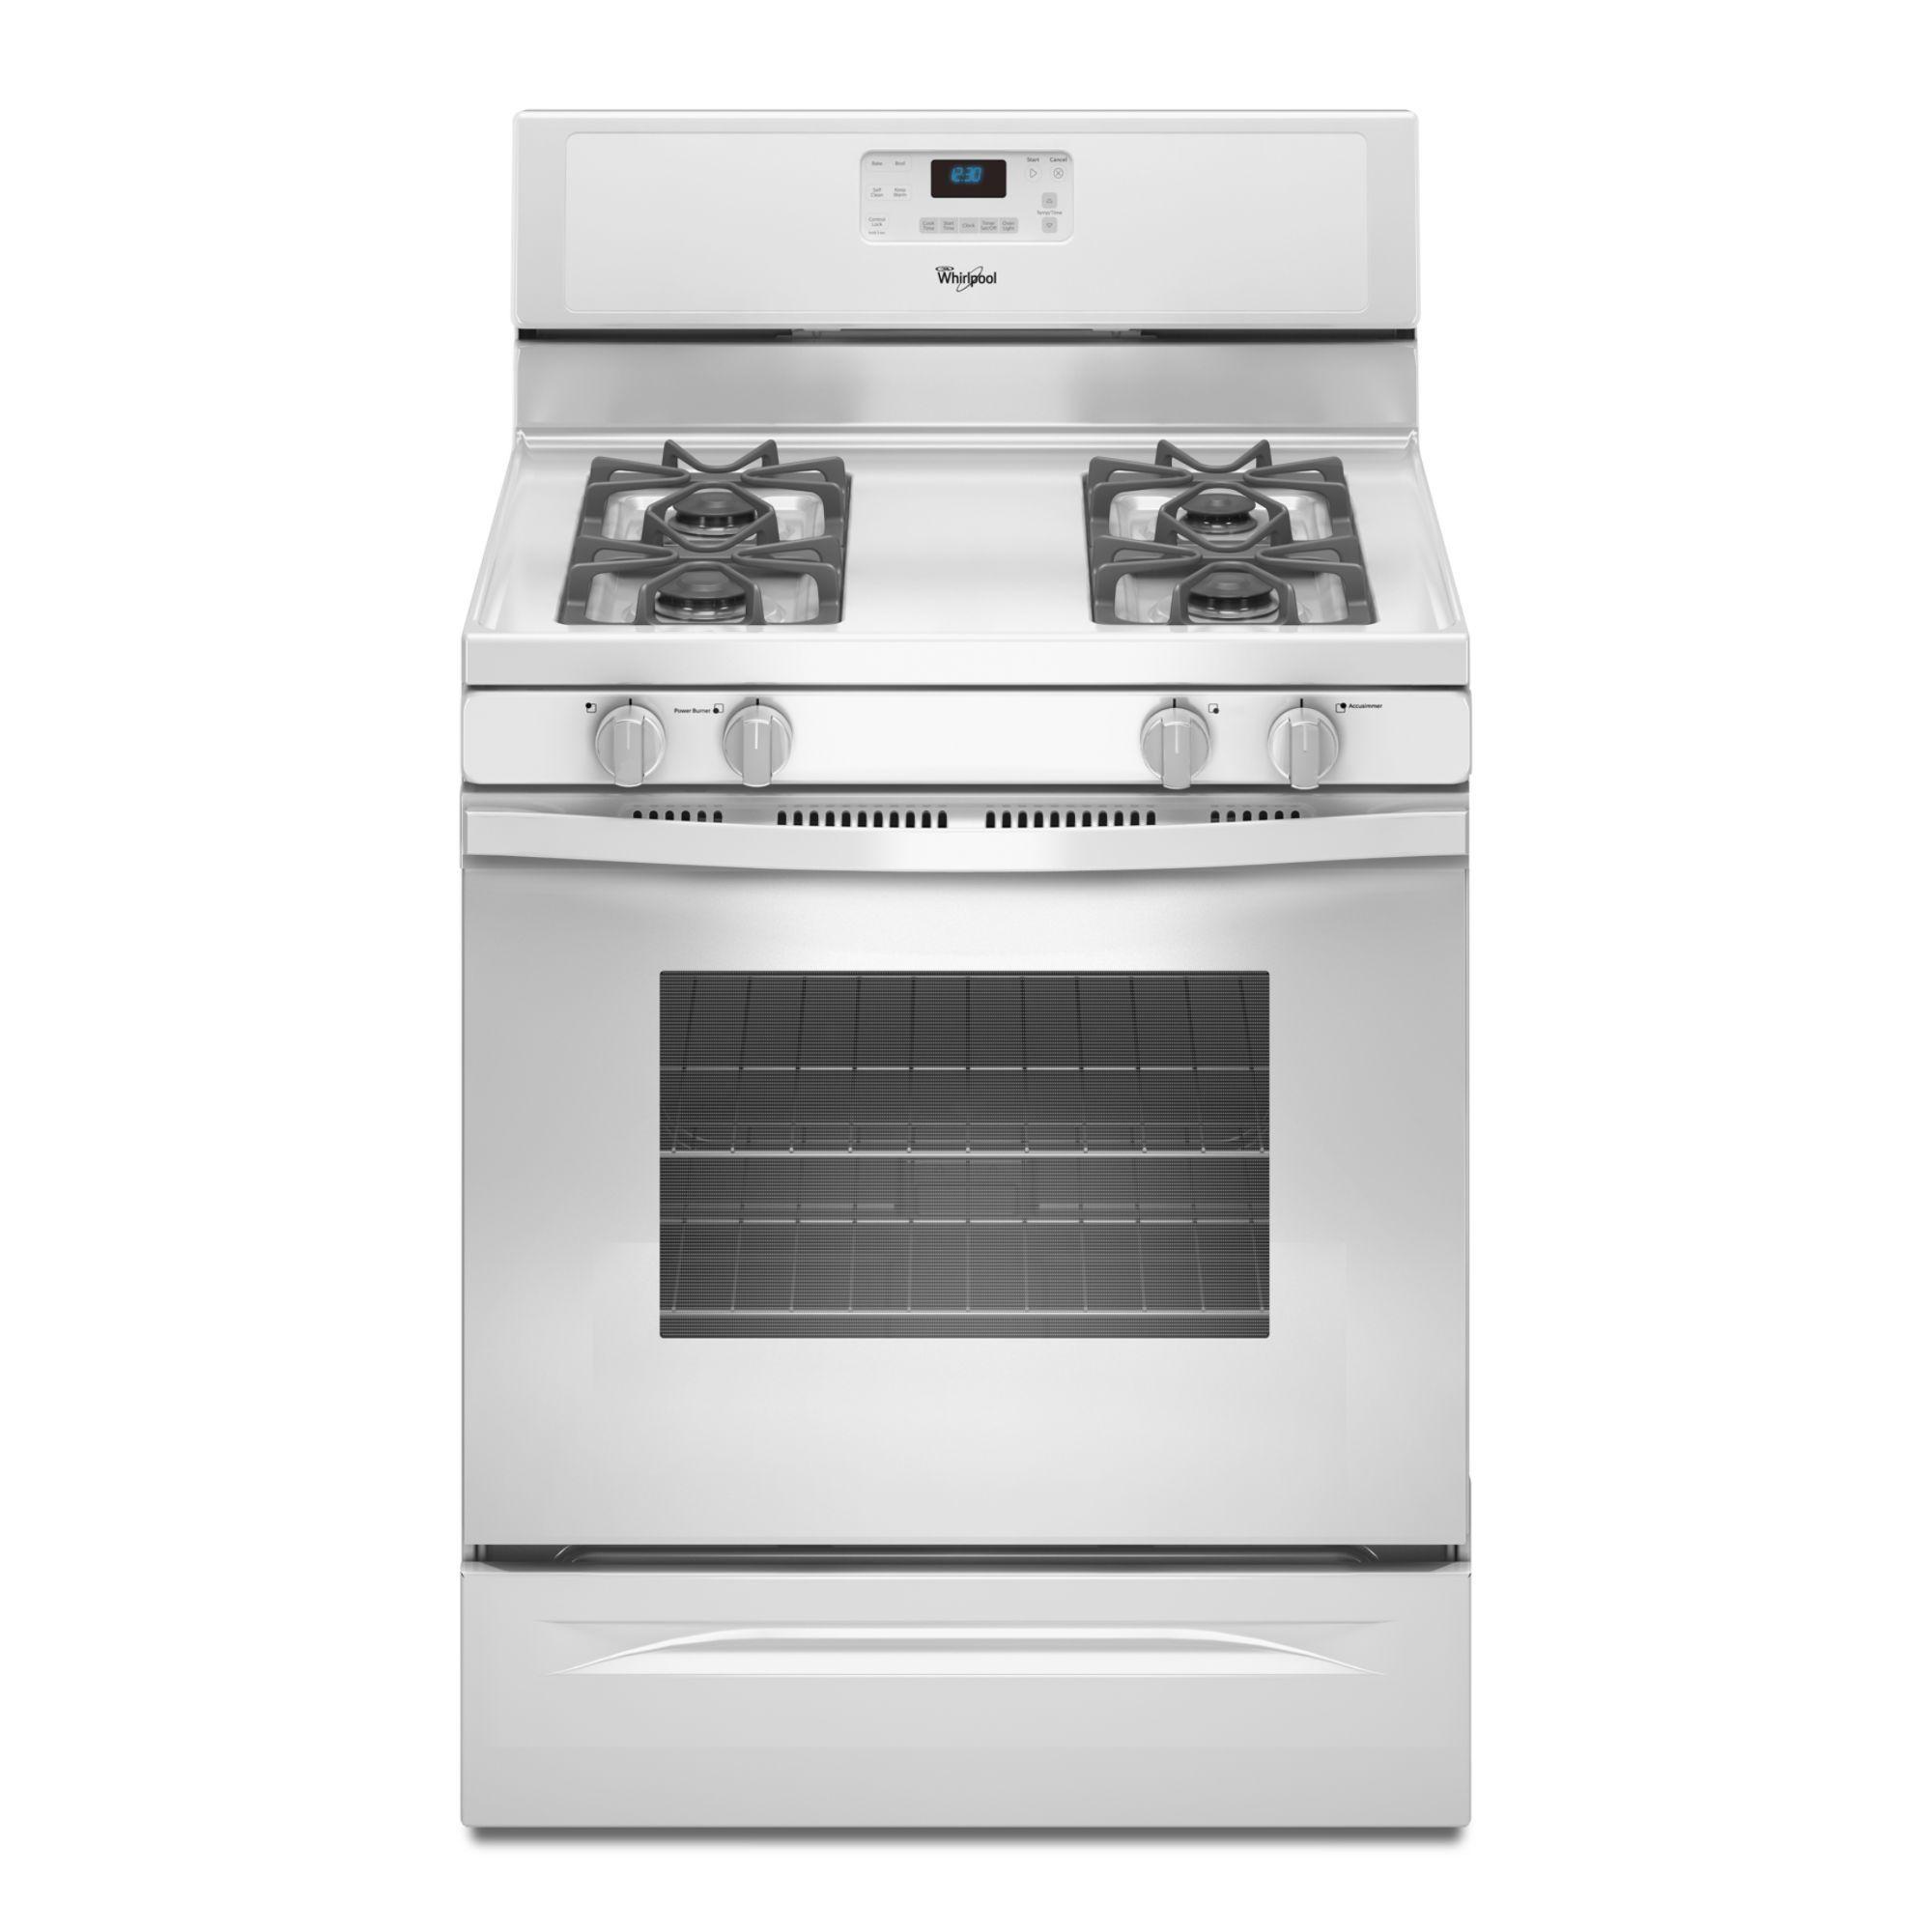 Best Buy Whirlpool Accubake 30 Self Cleaning Freestanding Gas Range White Wfg361lvq